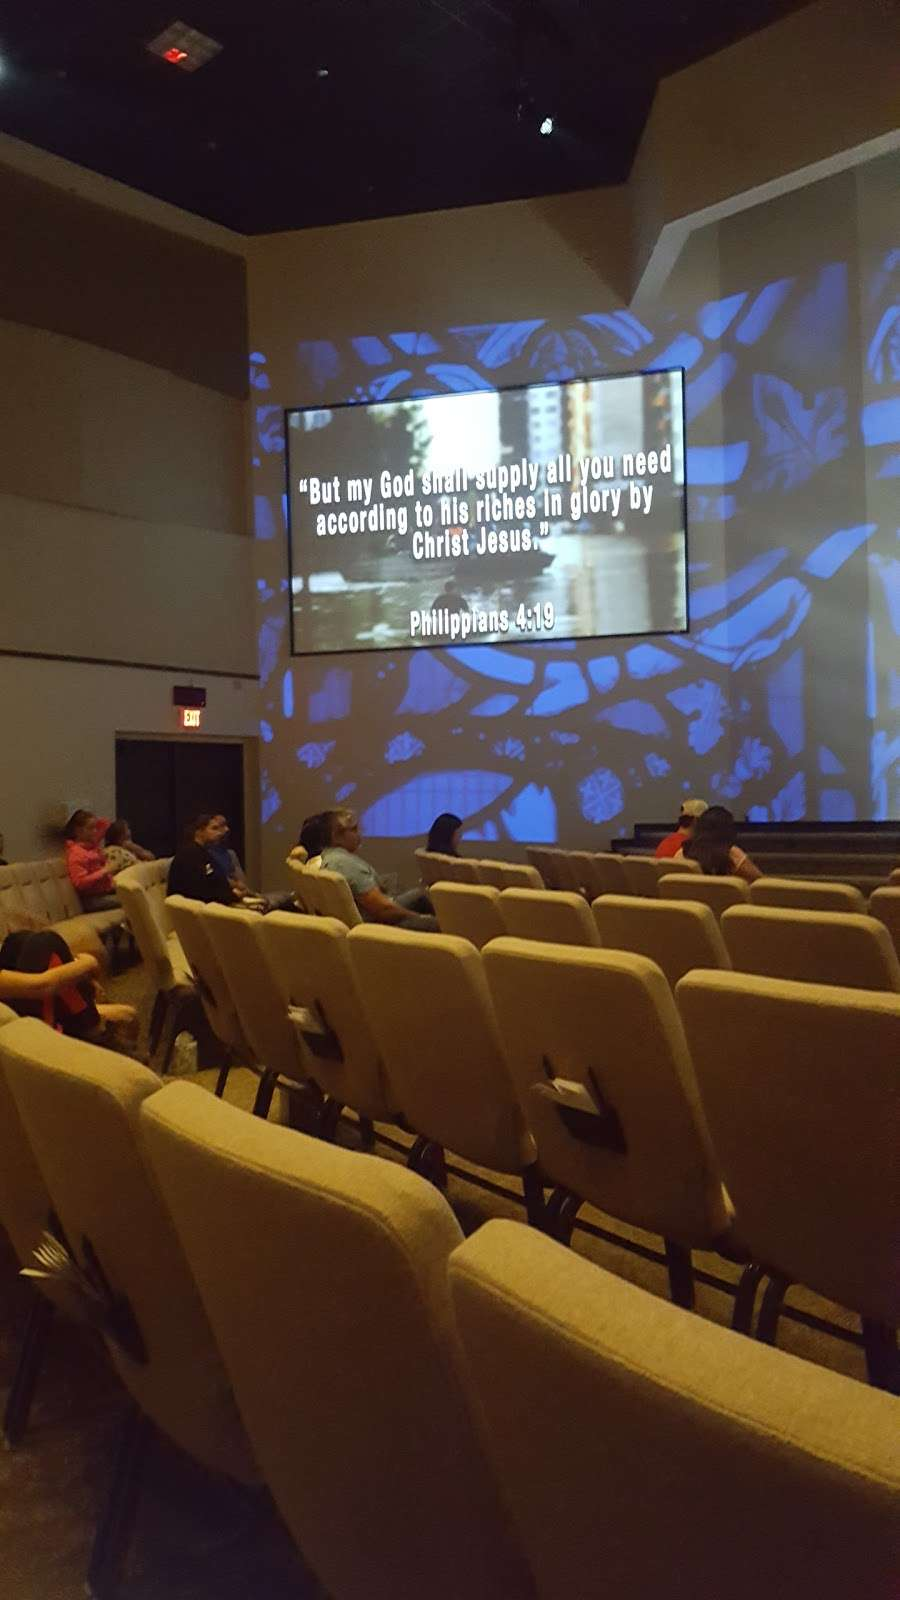 Crossroads Fellowship - church  | Photo 9 of 10 | Address: 12110 East Sam Houston Pkwy N, Houston, TX 77044, USA | Phone: (713) 455-1661